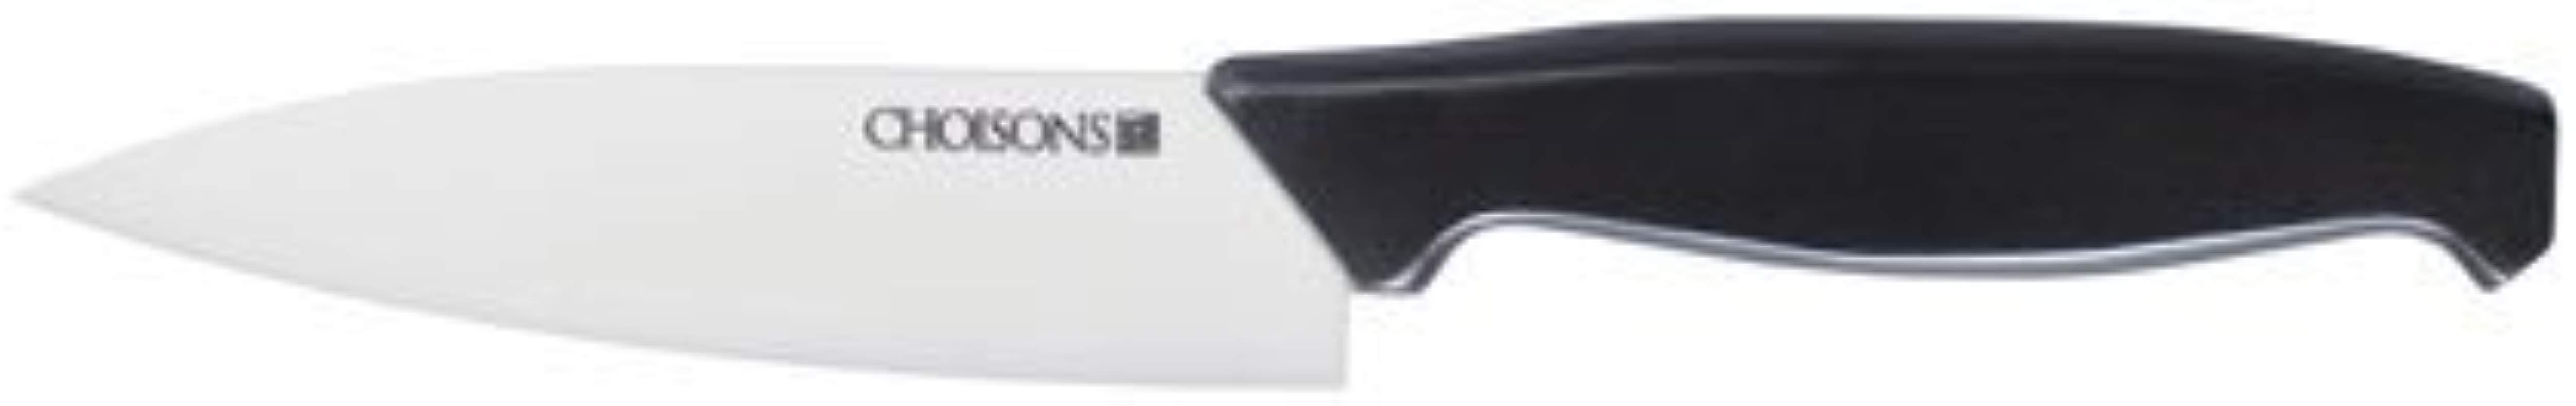 Tribest Choisons CW105U Fine Ceramic Cutlery 5 Original Series Utility Knife